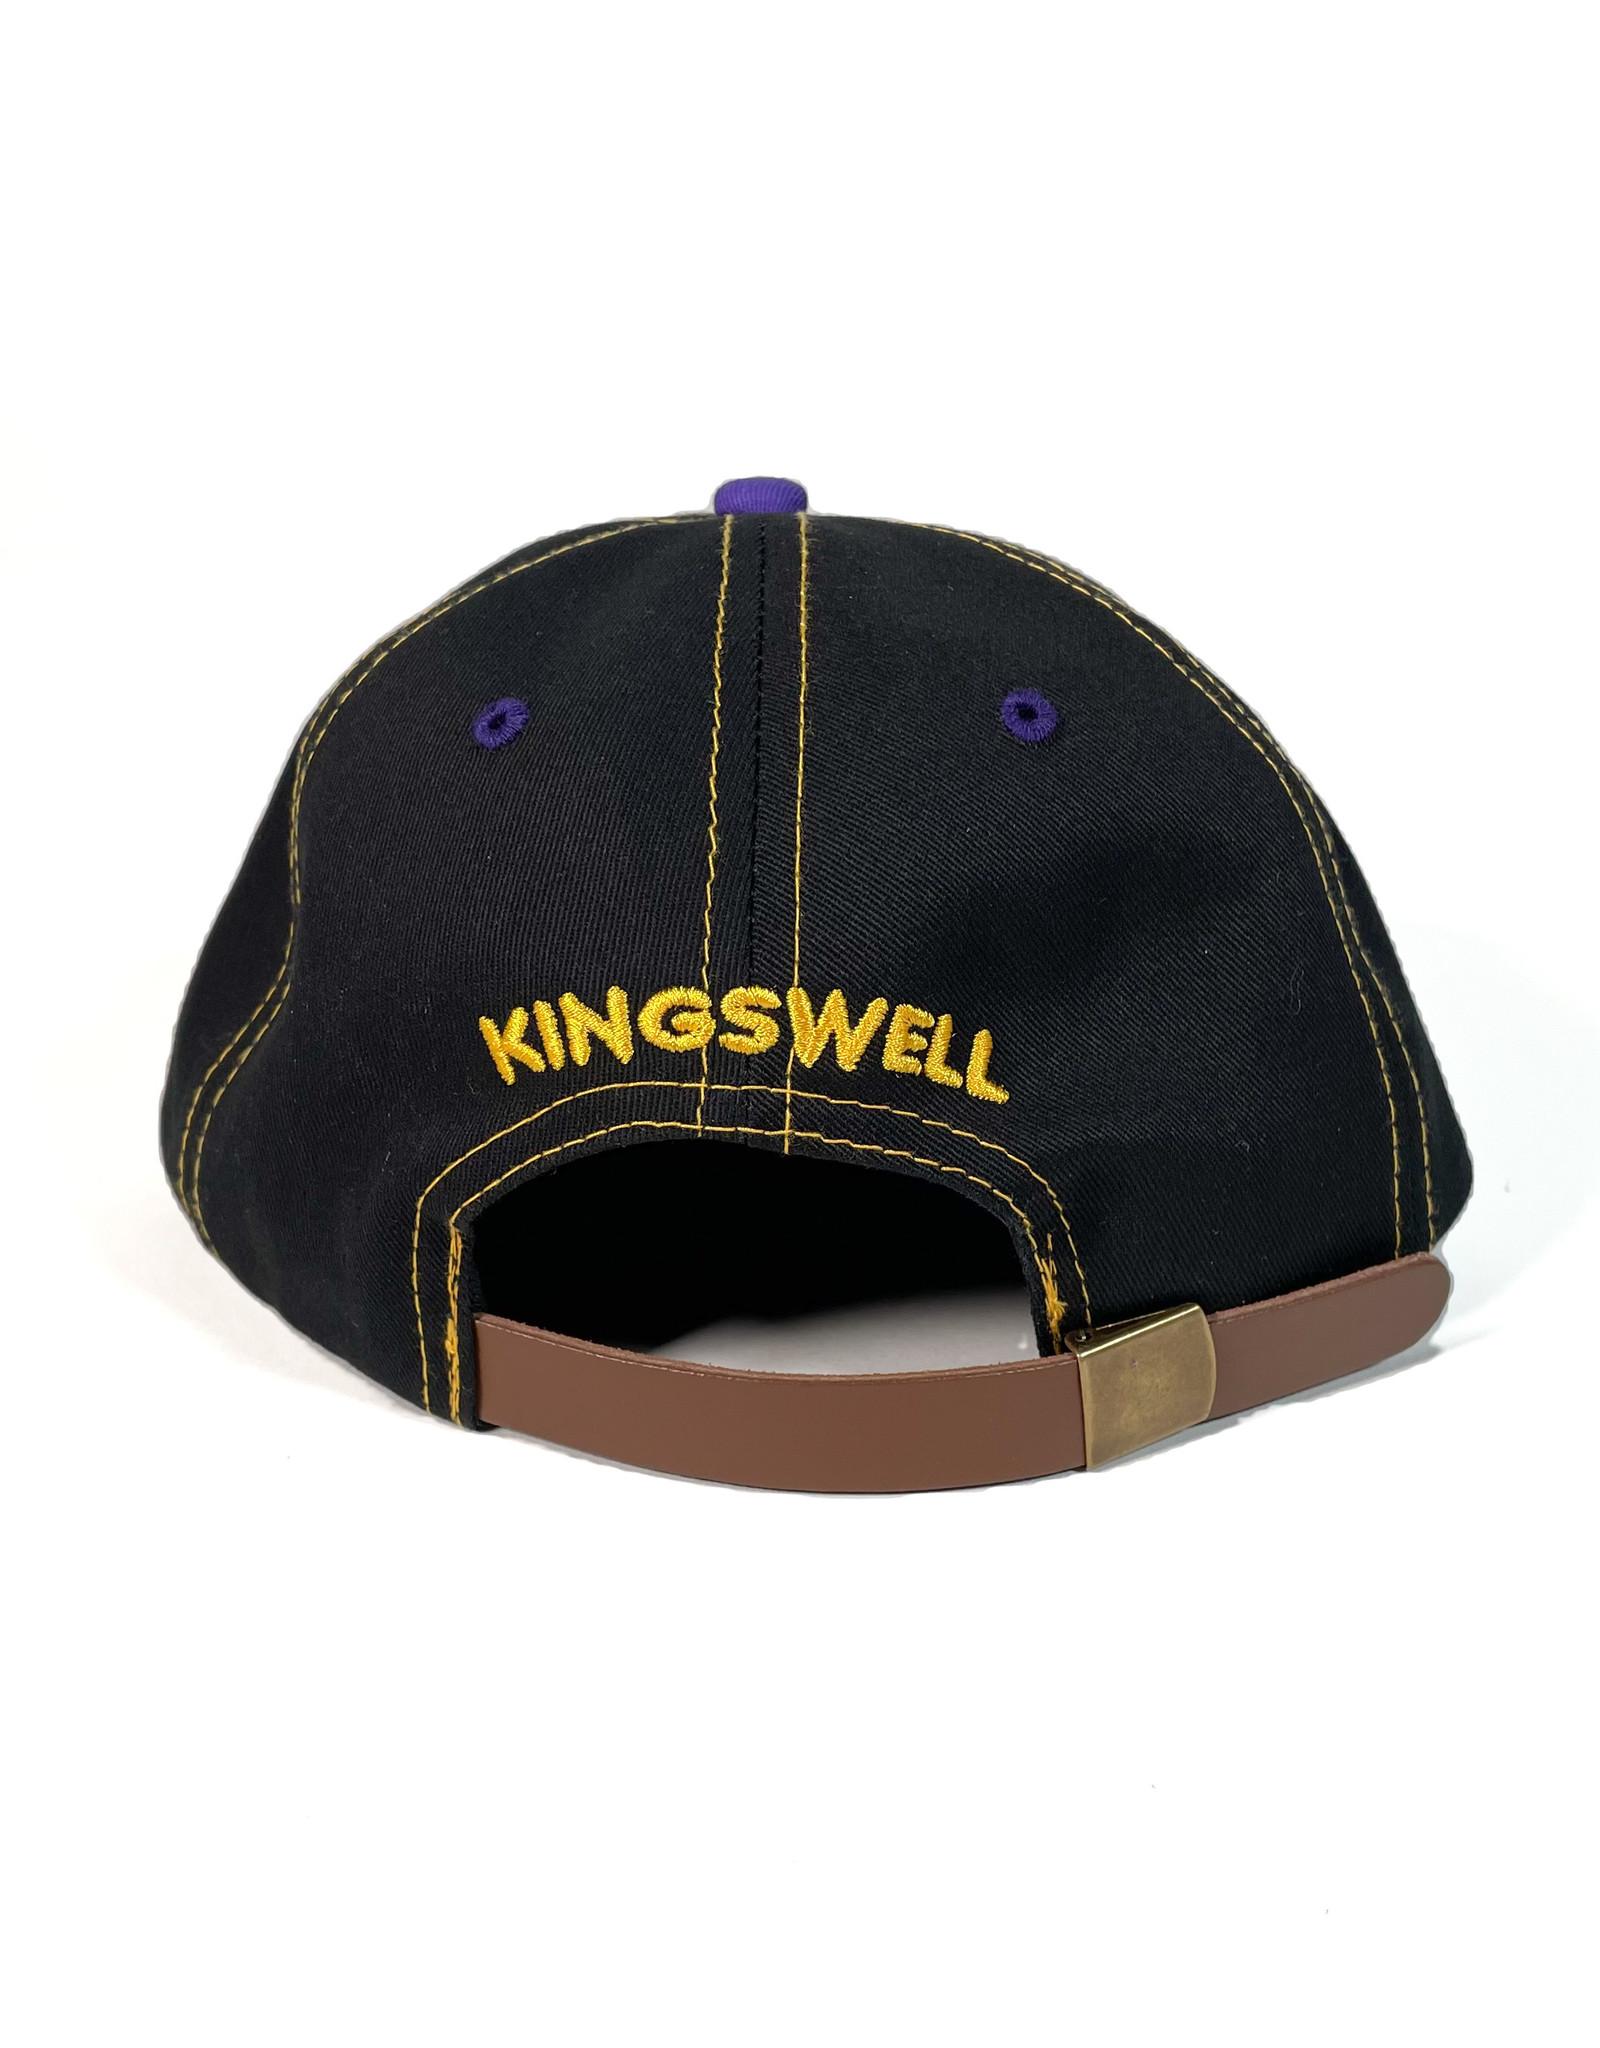 KINGSWELL KINGSWELL MOUSE RIPPER 6 PANEL HAT - PURPLE / BLACK